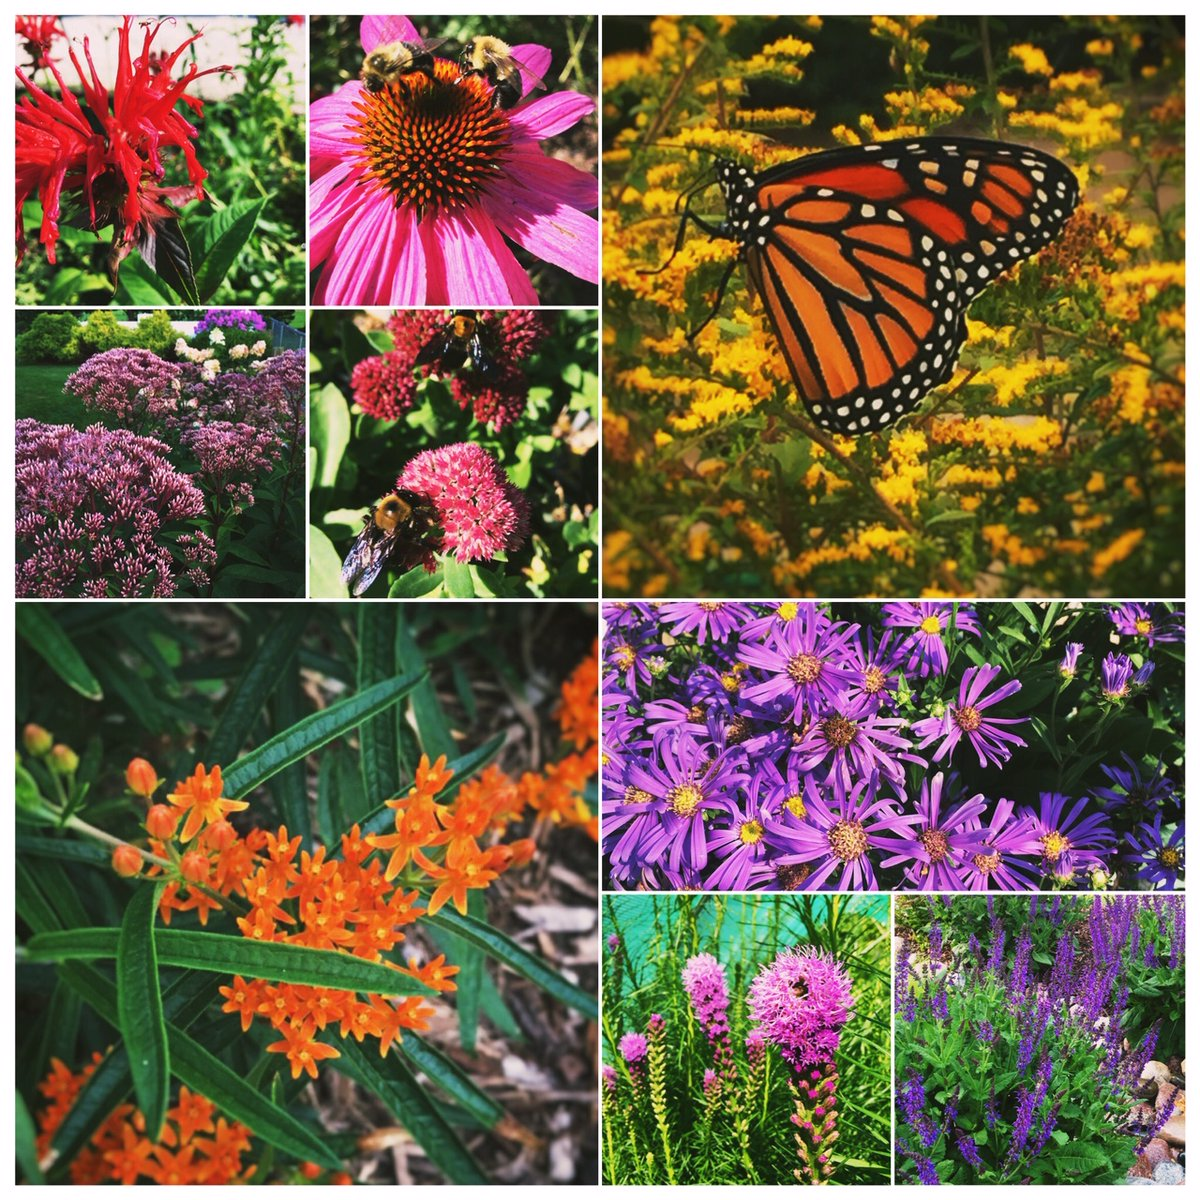 What will you plant to celebrate #NationalPollinatorWeek ?pic.twitter.com/ZcHqjmkEJL